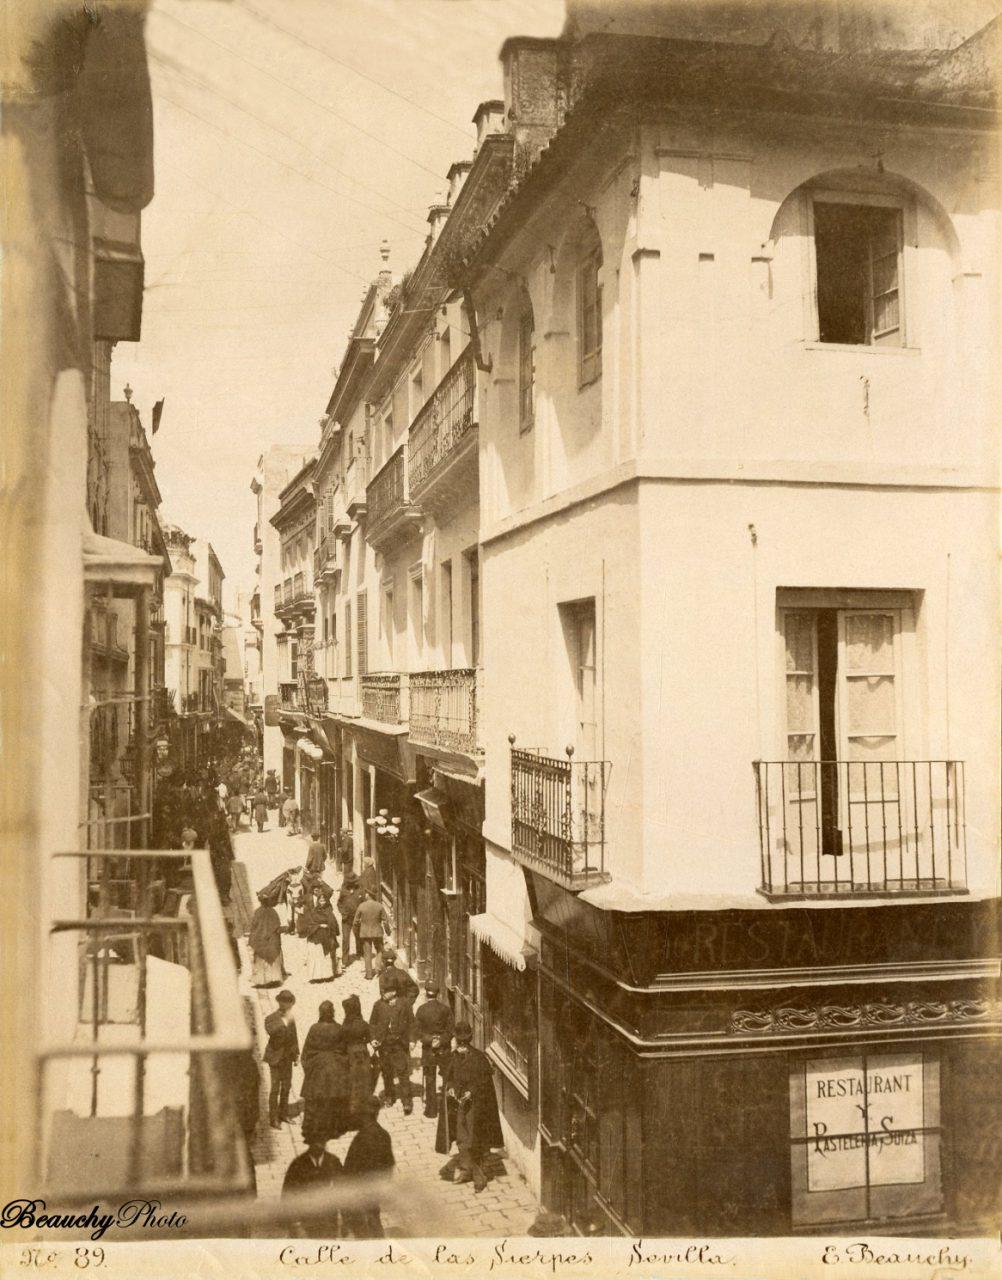 Beauchyphoto_Calle_de_las_Sierpes_02_Emilio_Beauchy_Cano_fotografias_antiguas_postales_vistas_y_monumentos